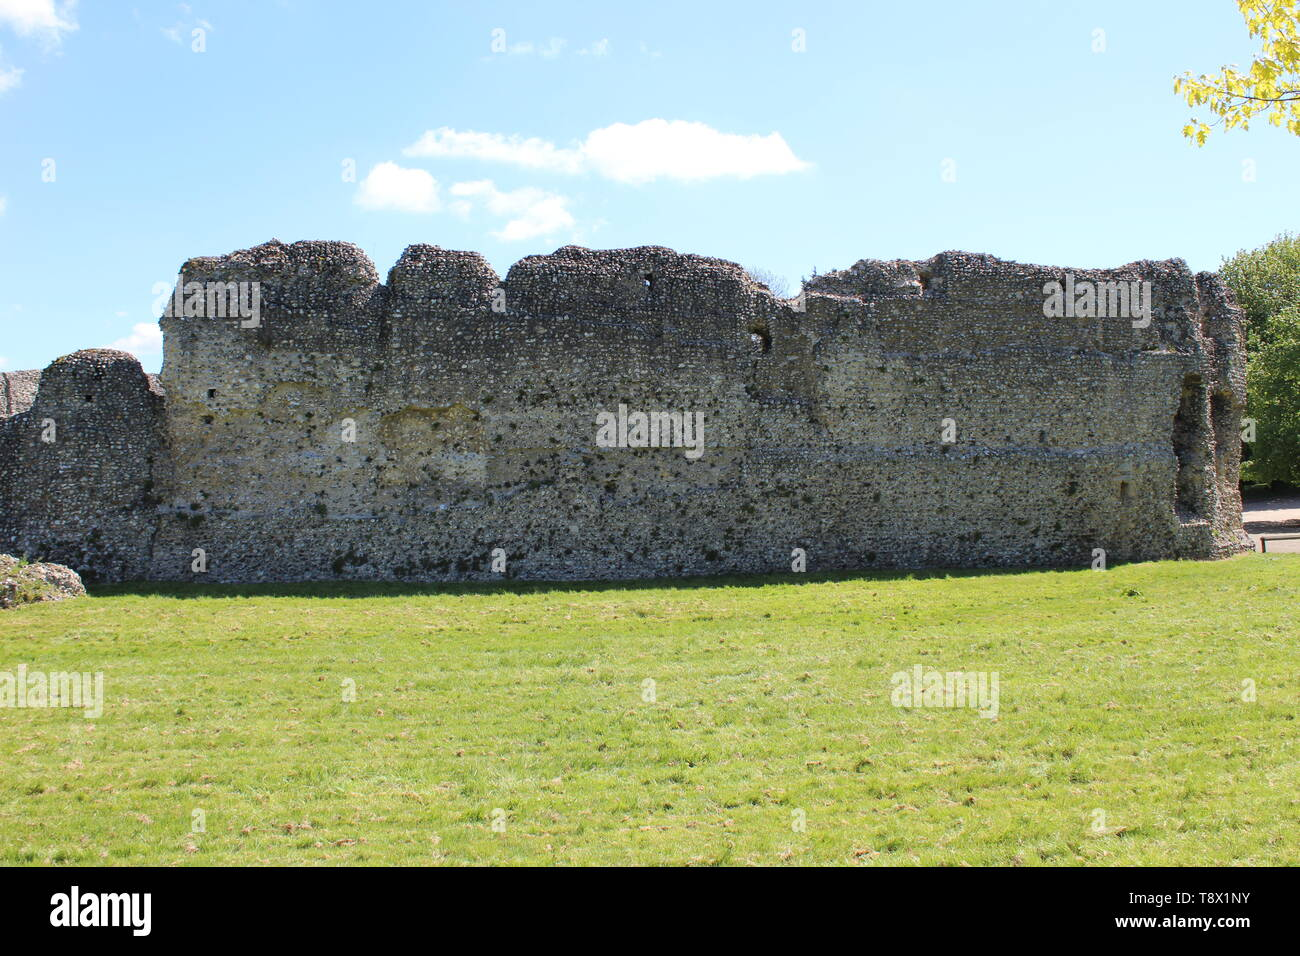 Eynsford castle #6 - Stock Image